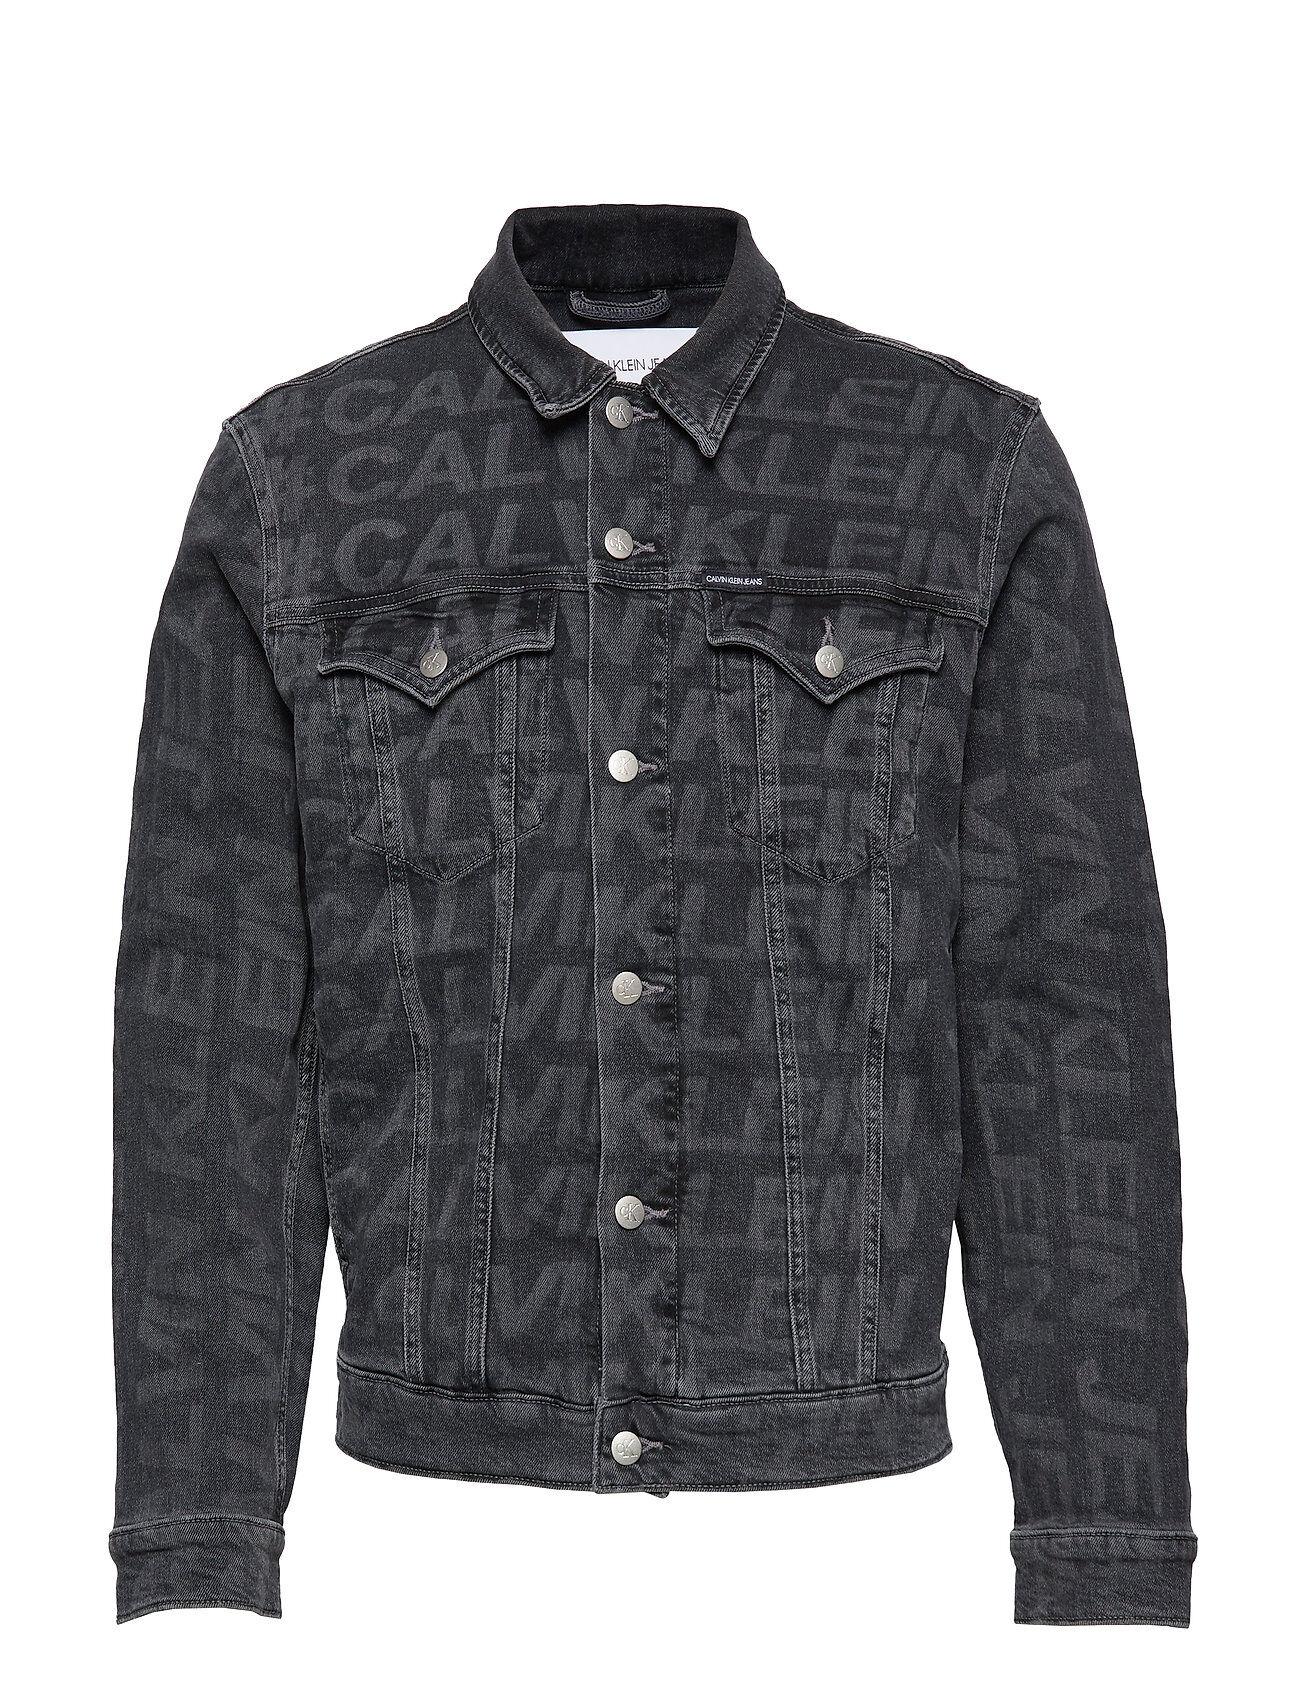 Image of Calvin Foundation Slim Denim Jacket Farkkutakki Denimtakki Harmaa Calvin Klein Jeans